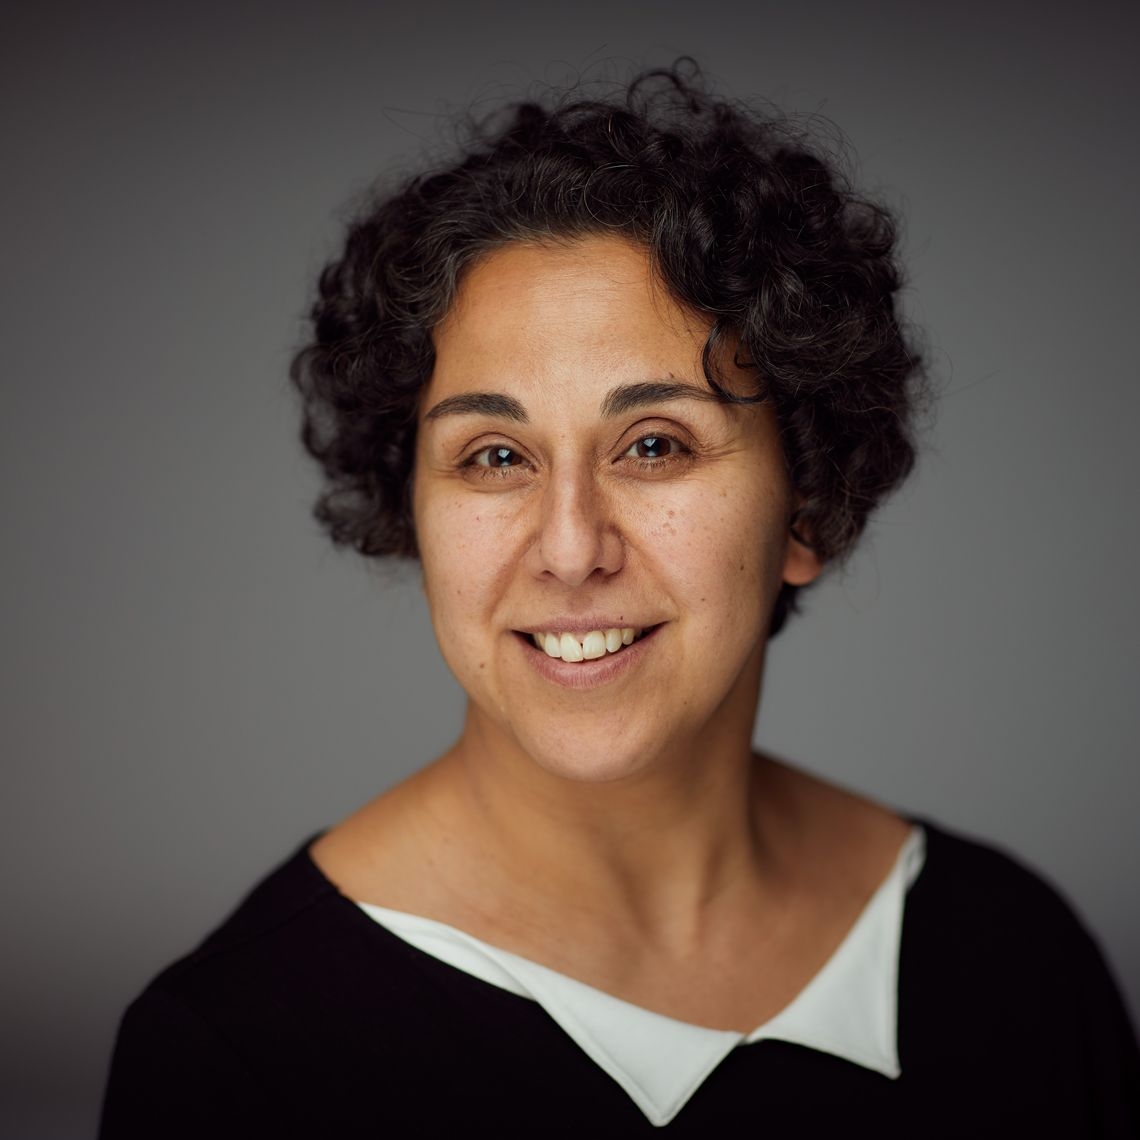 Professor Proochista Ariana